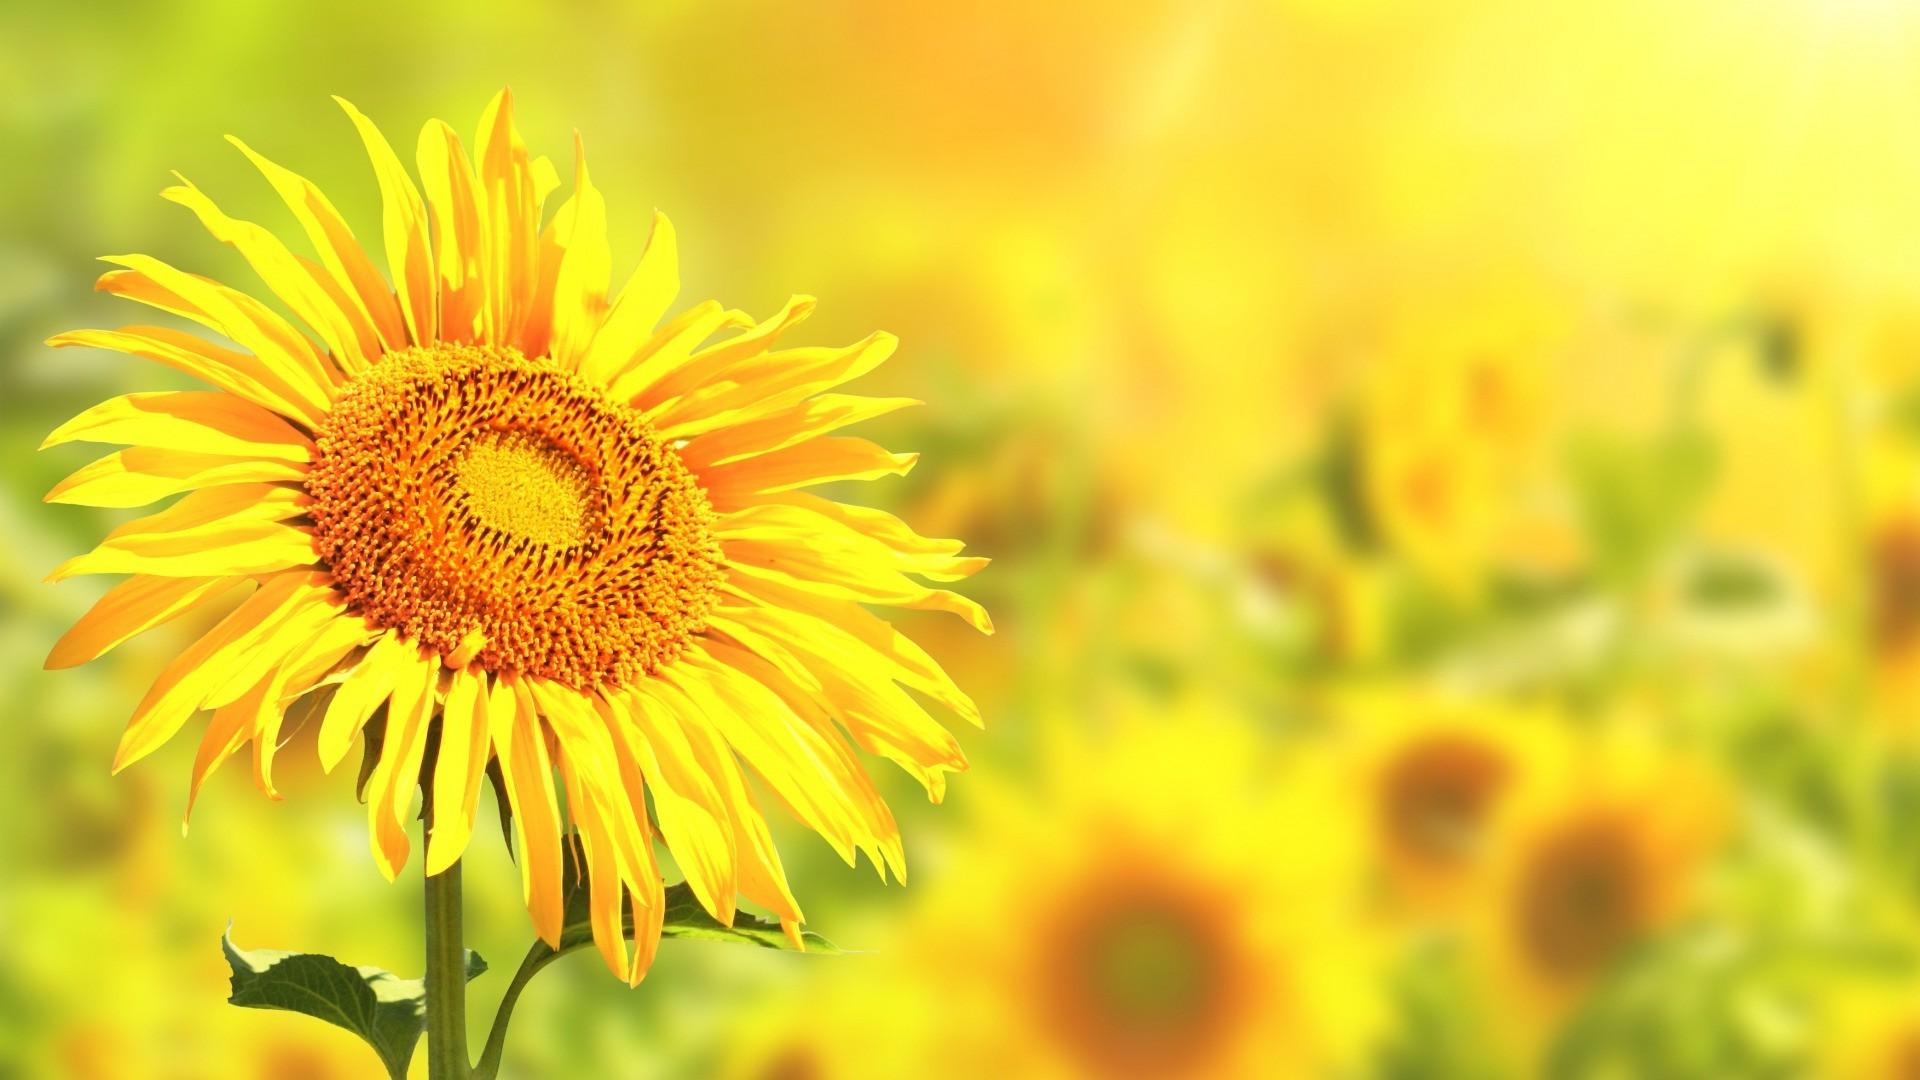 Wallpaper : 1920x1080 px, flowers, nature, sunflowers ...